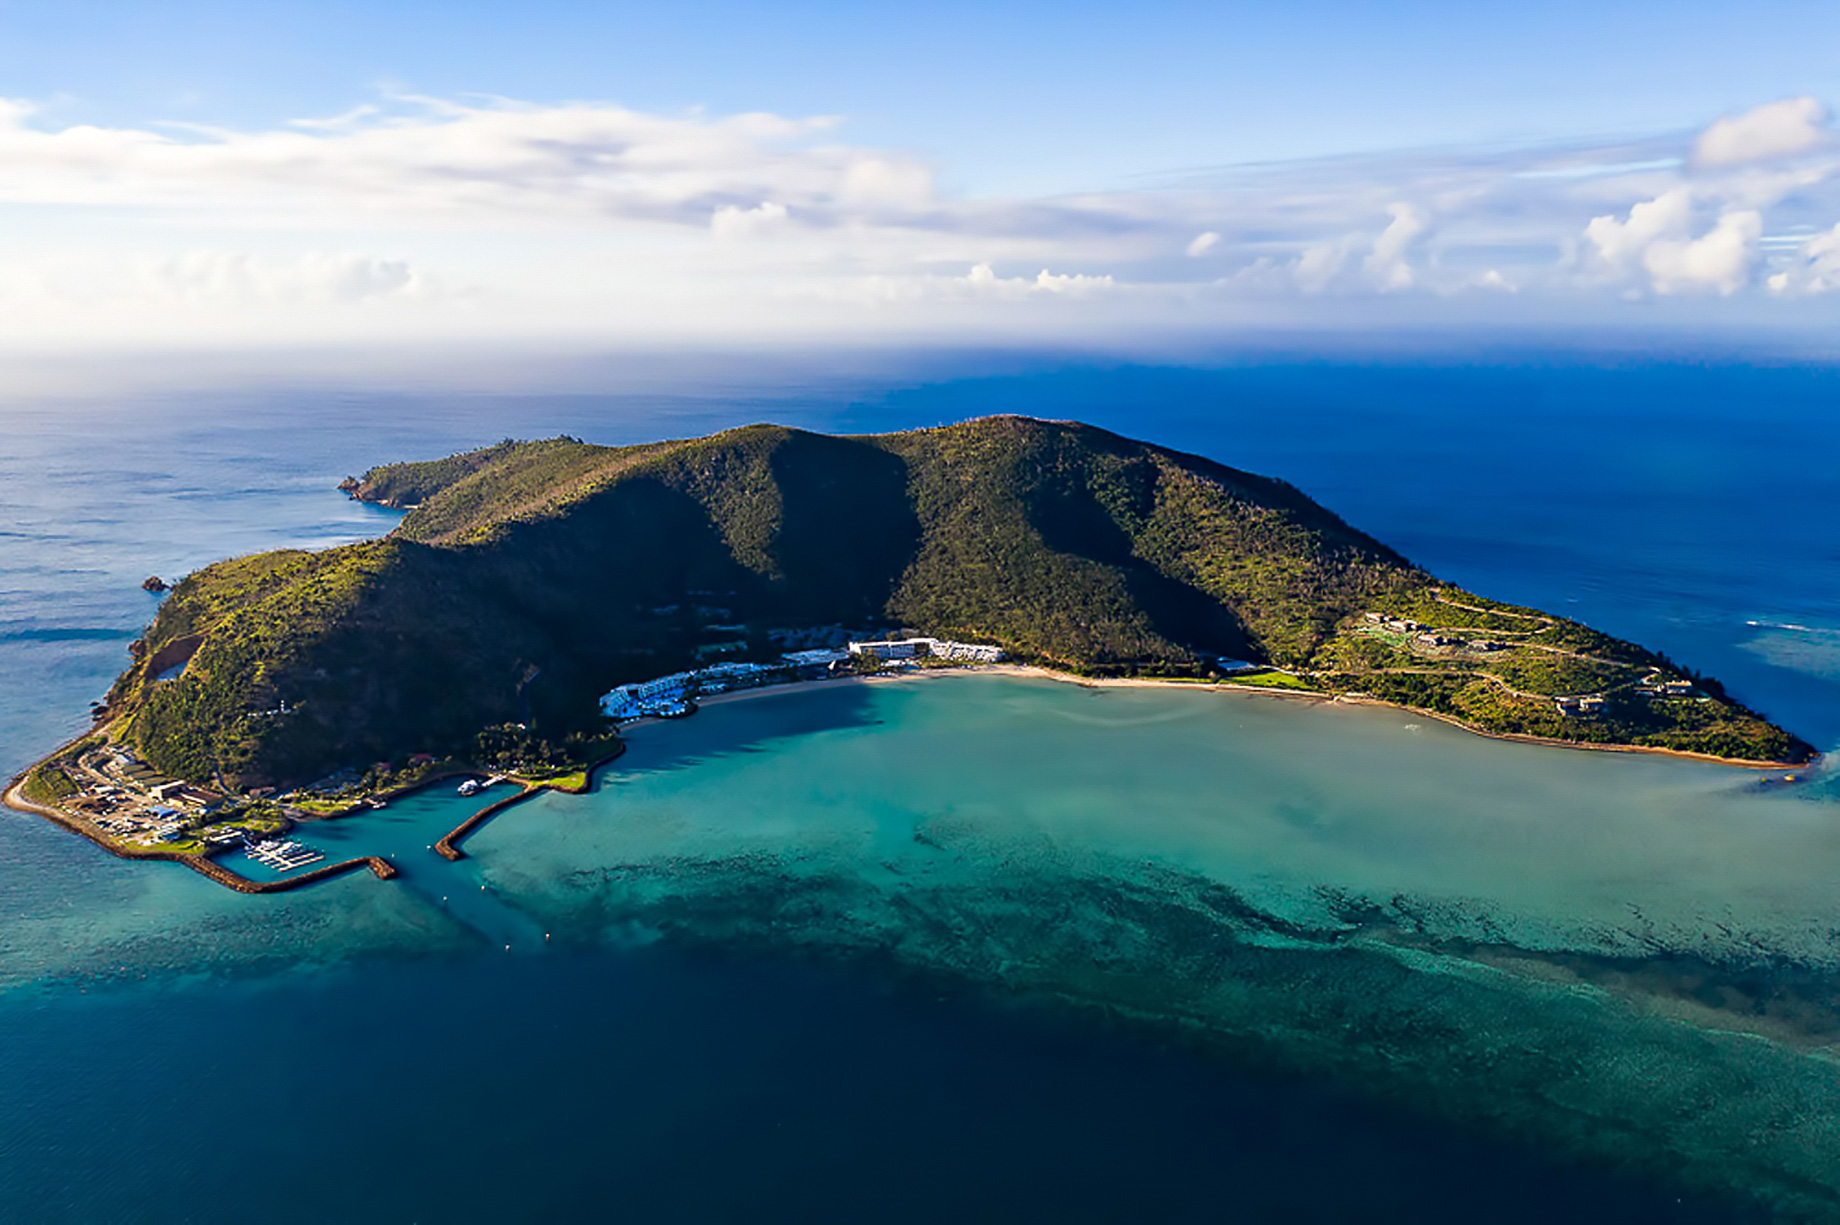 InterContinental Hayman Island Resort - Whitsunday Islands, Australia